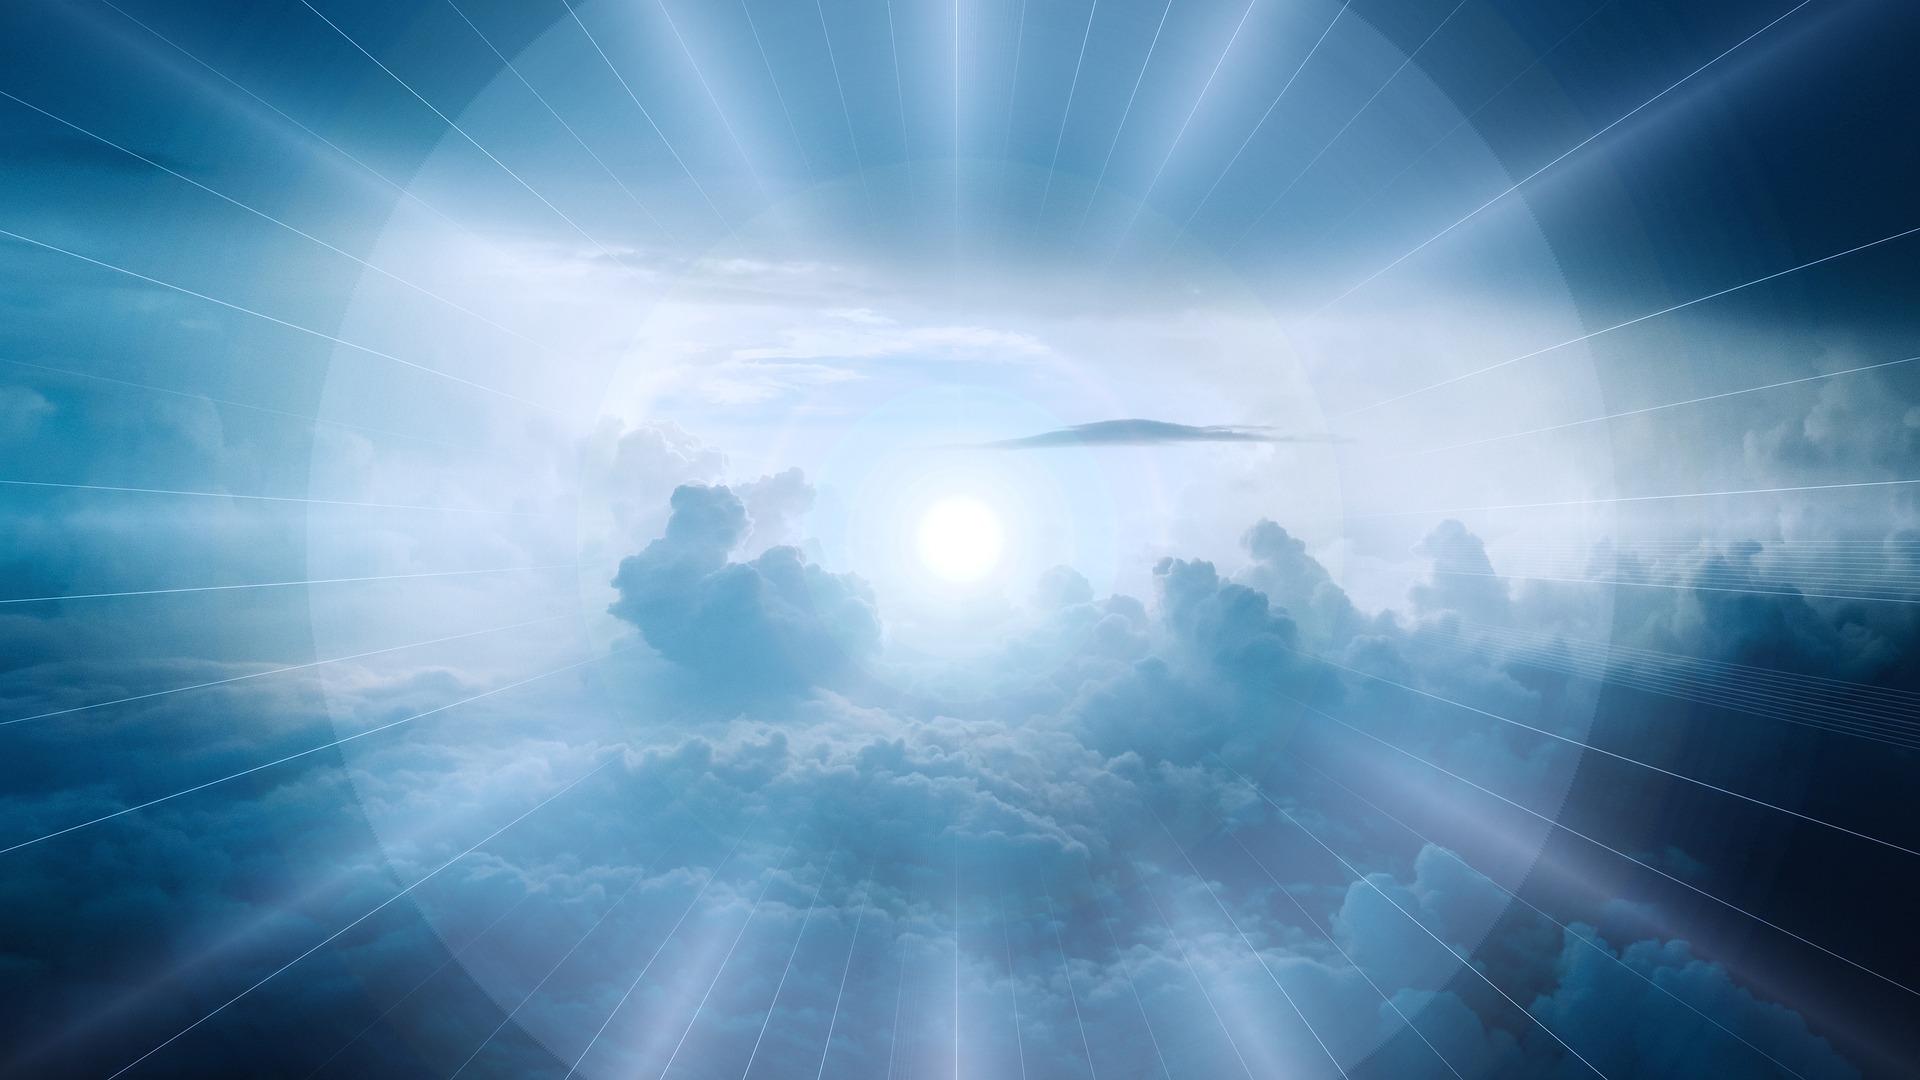 clouds-3978914_1920.jpg